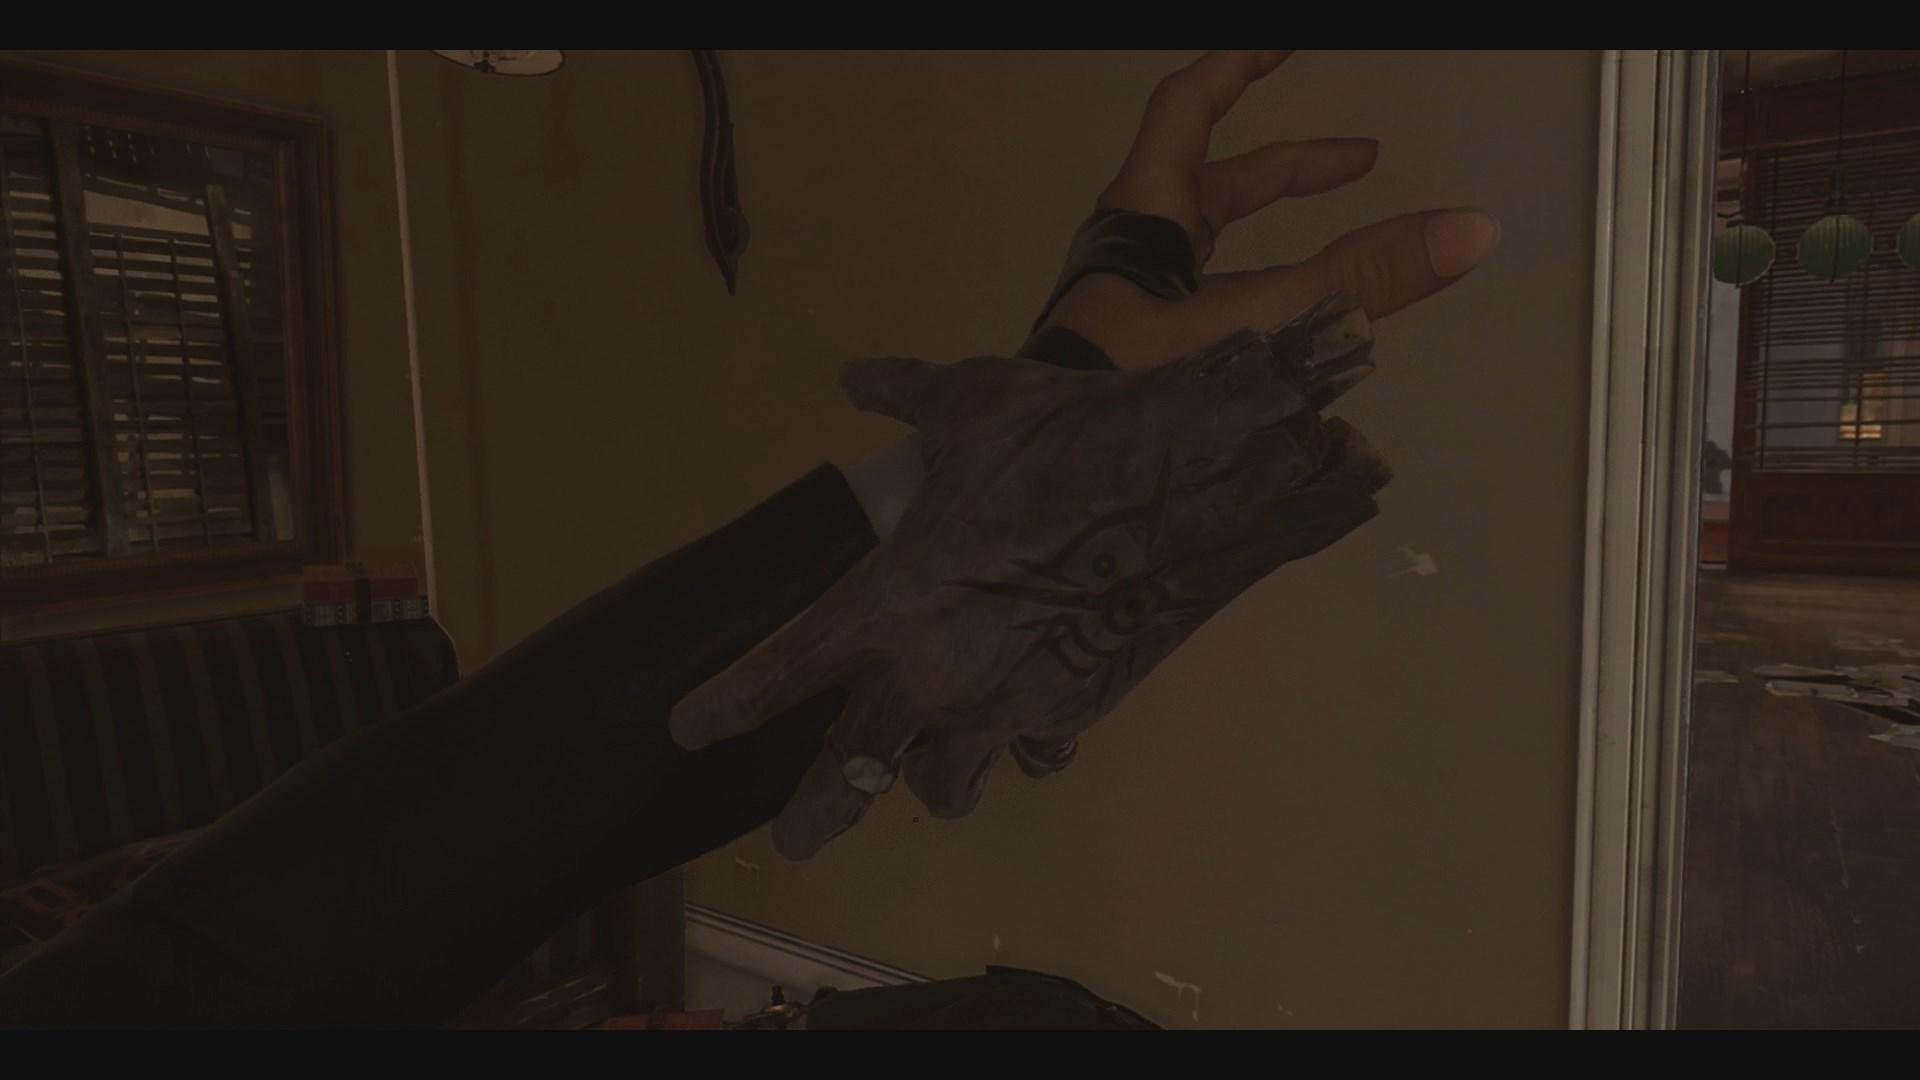 Dishonored 2 Mission 6 Bonecharm #2, #3, #4